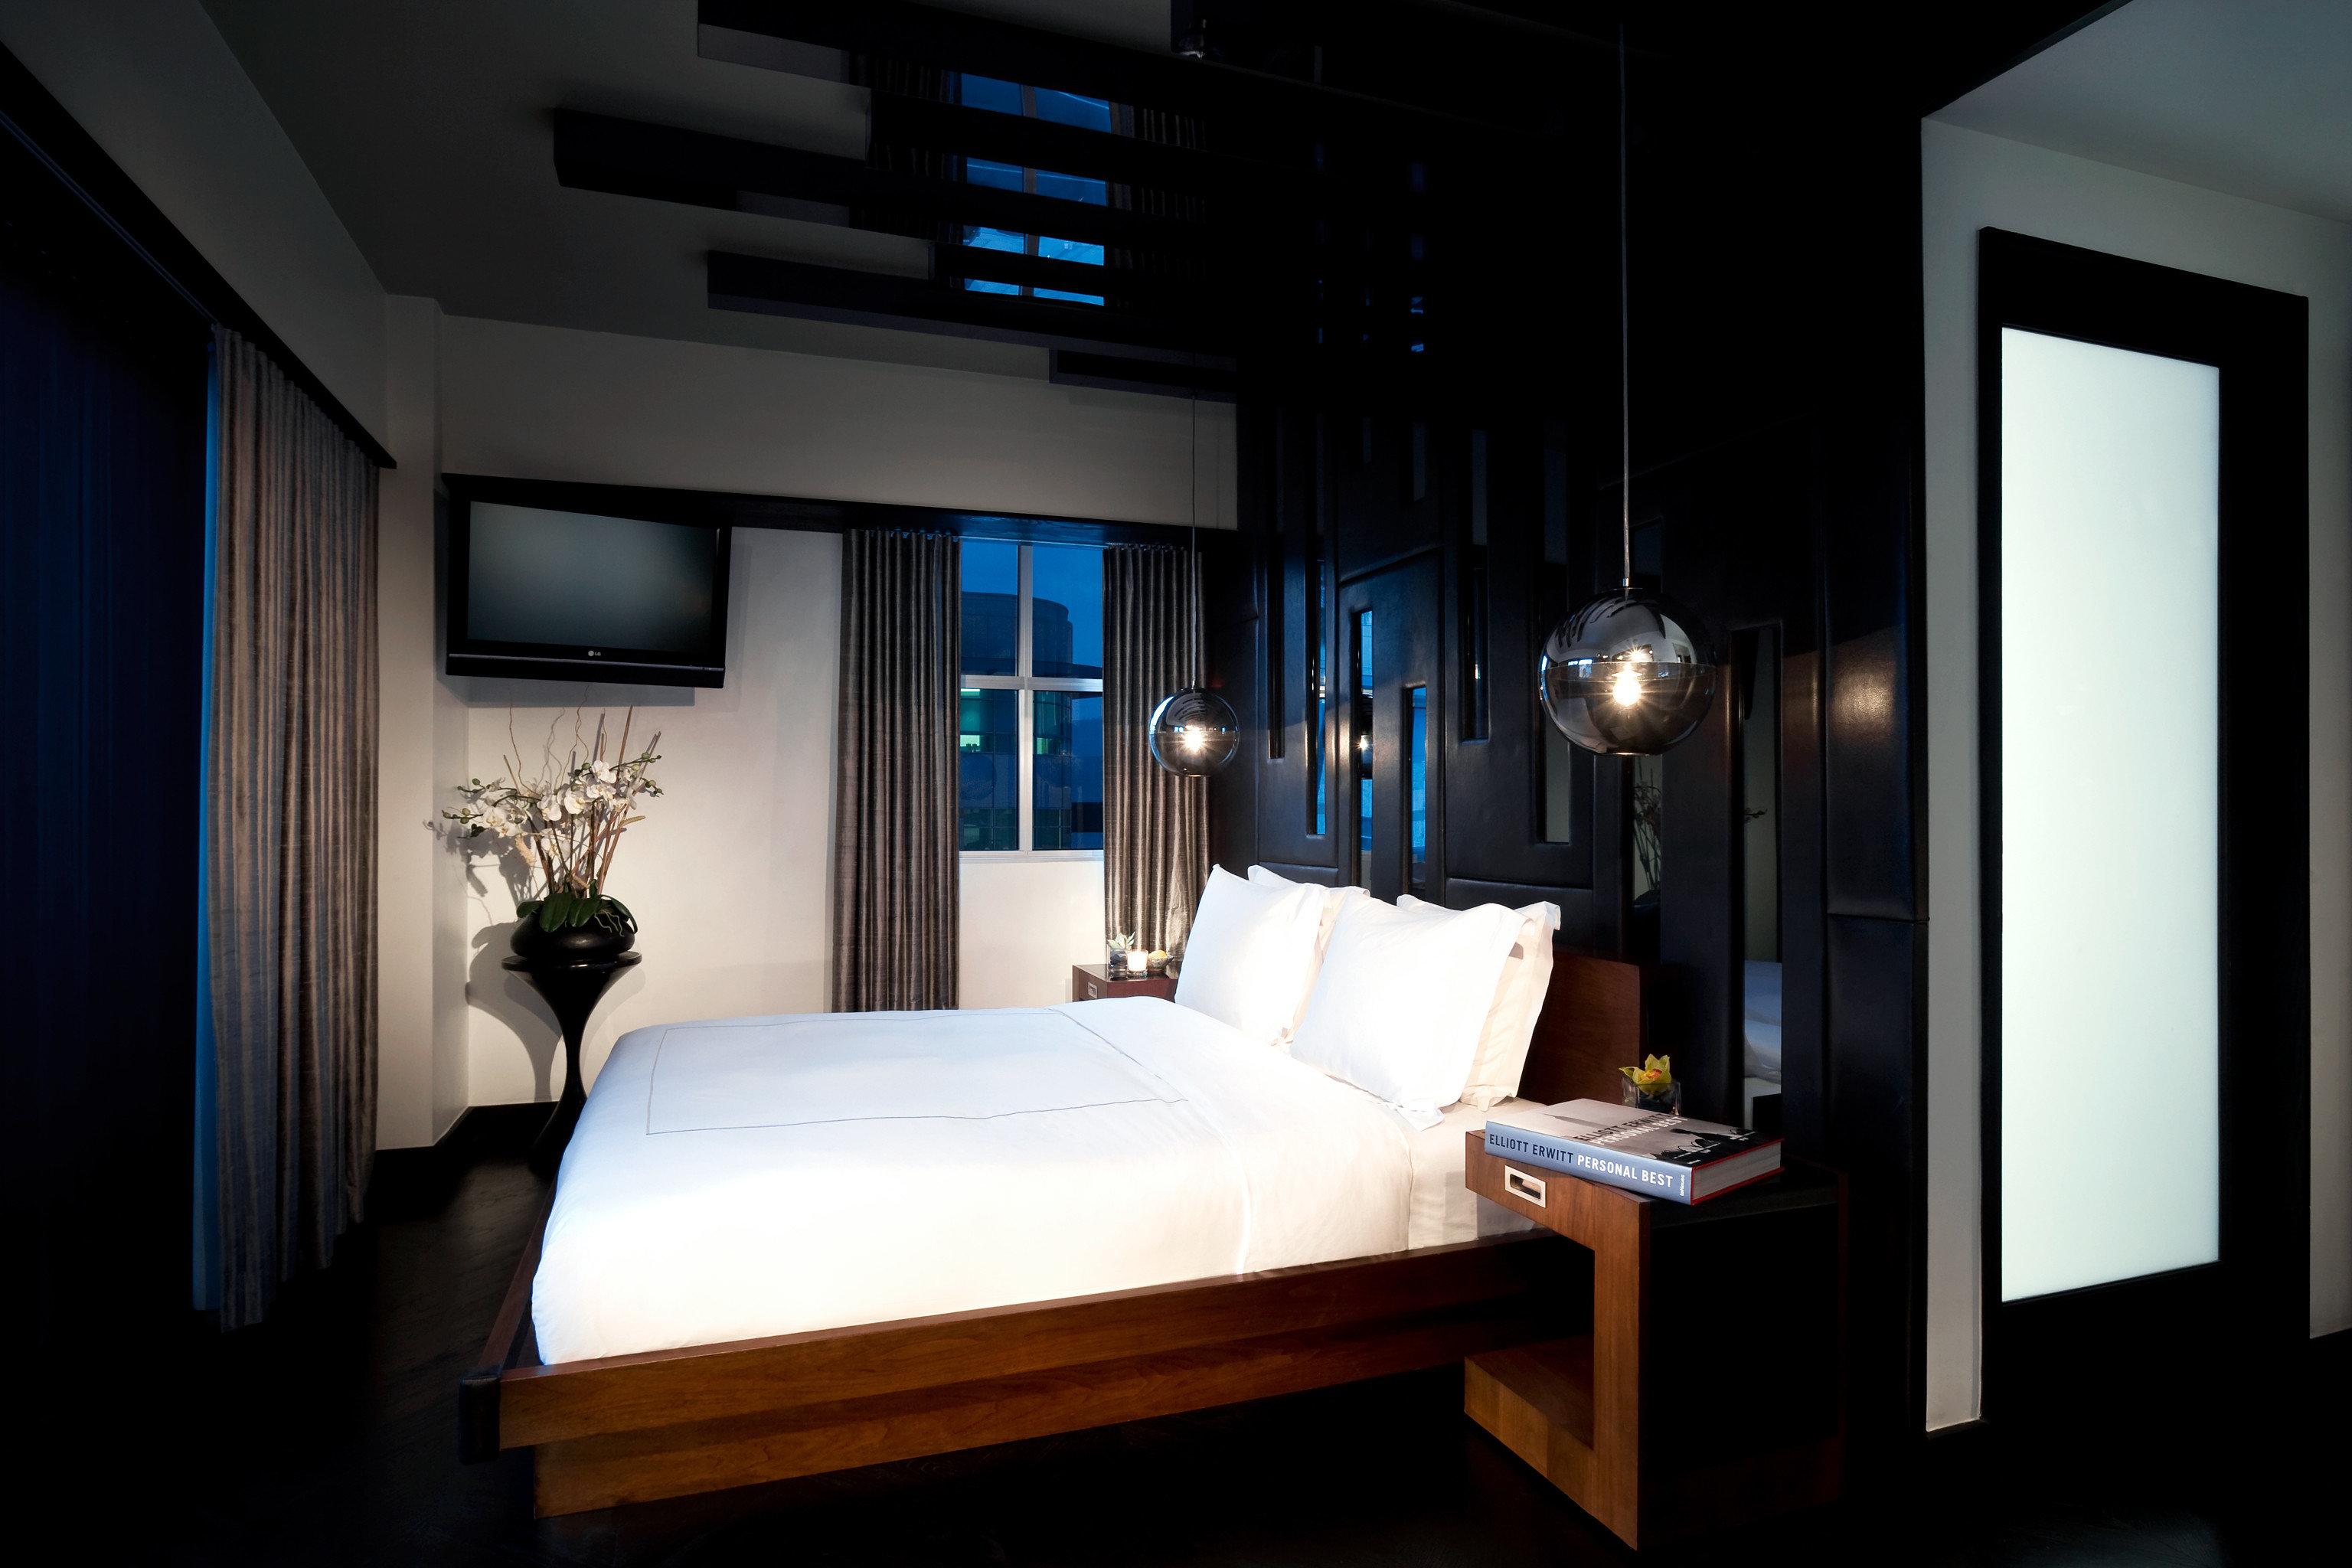 Bedroom Hip Hotels Modern Nightlife Party house Suite lighting home living room